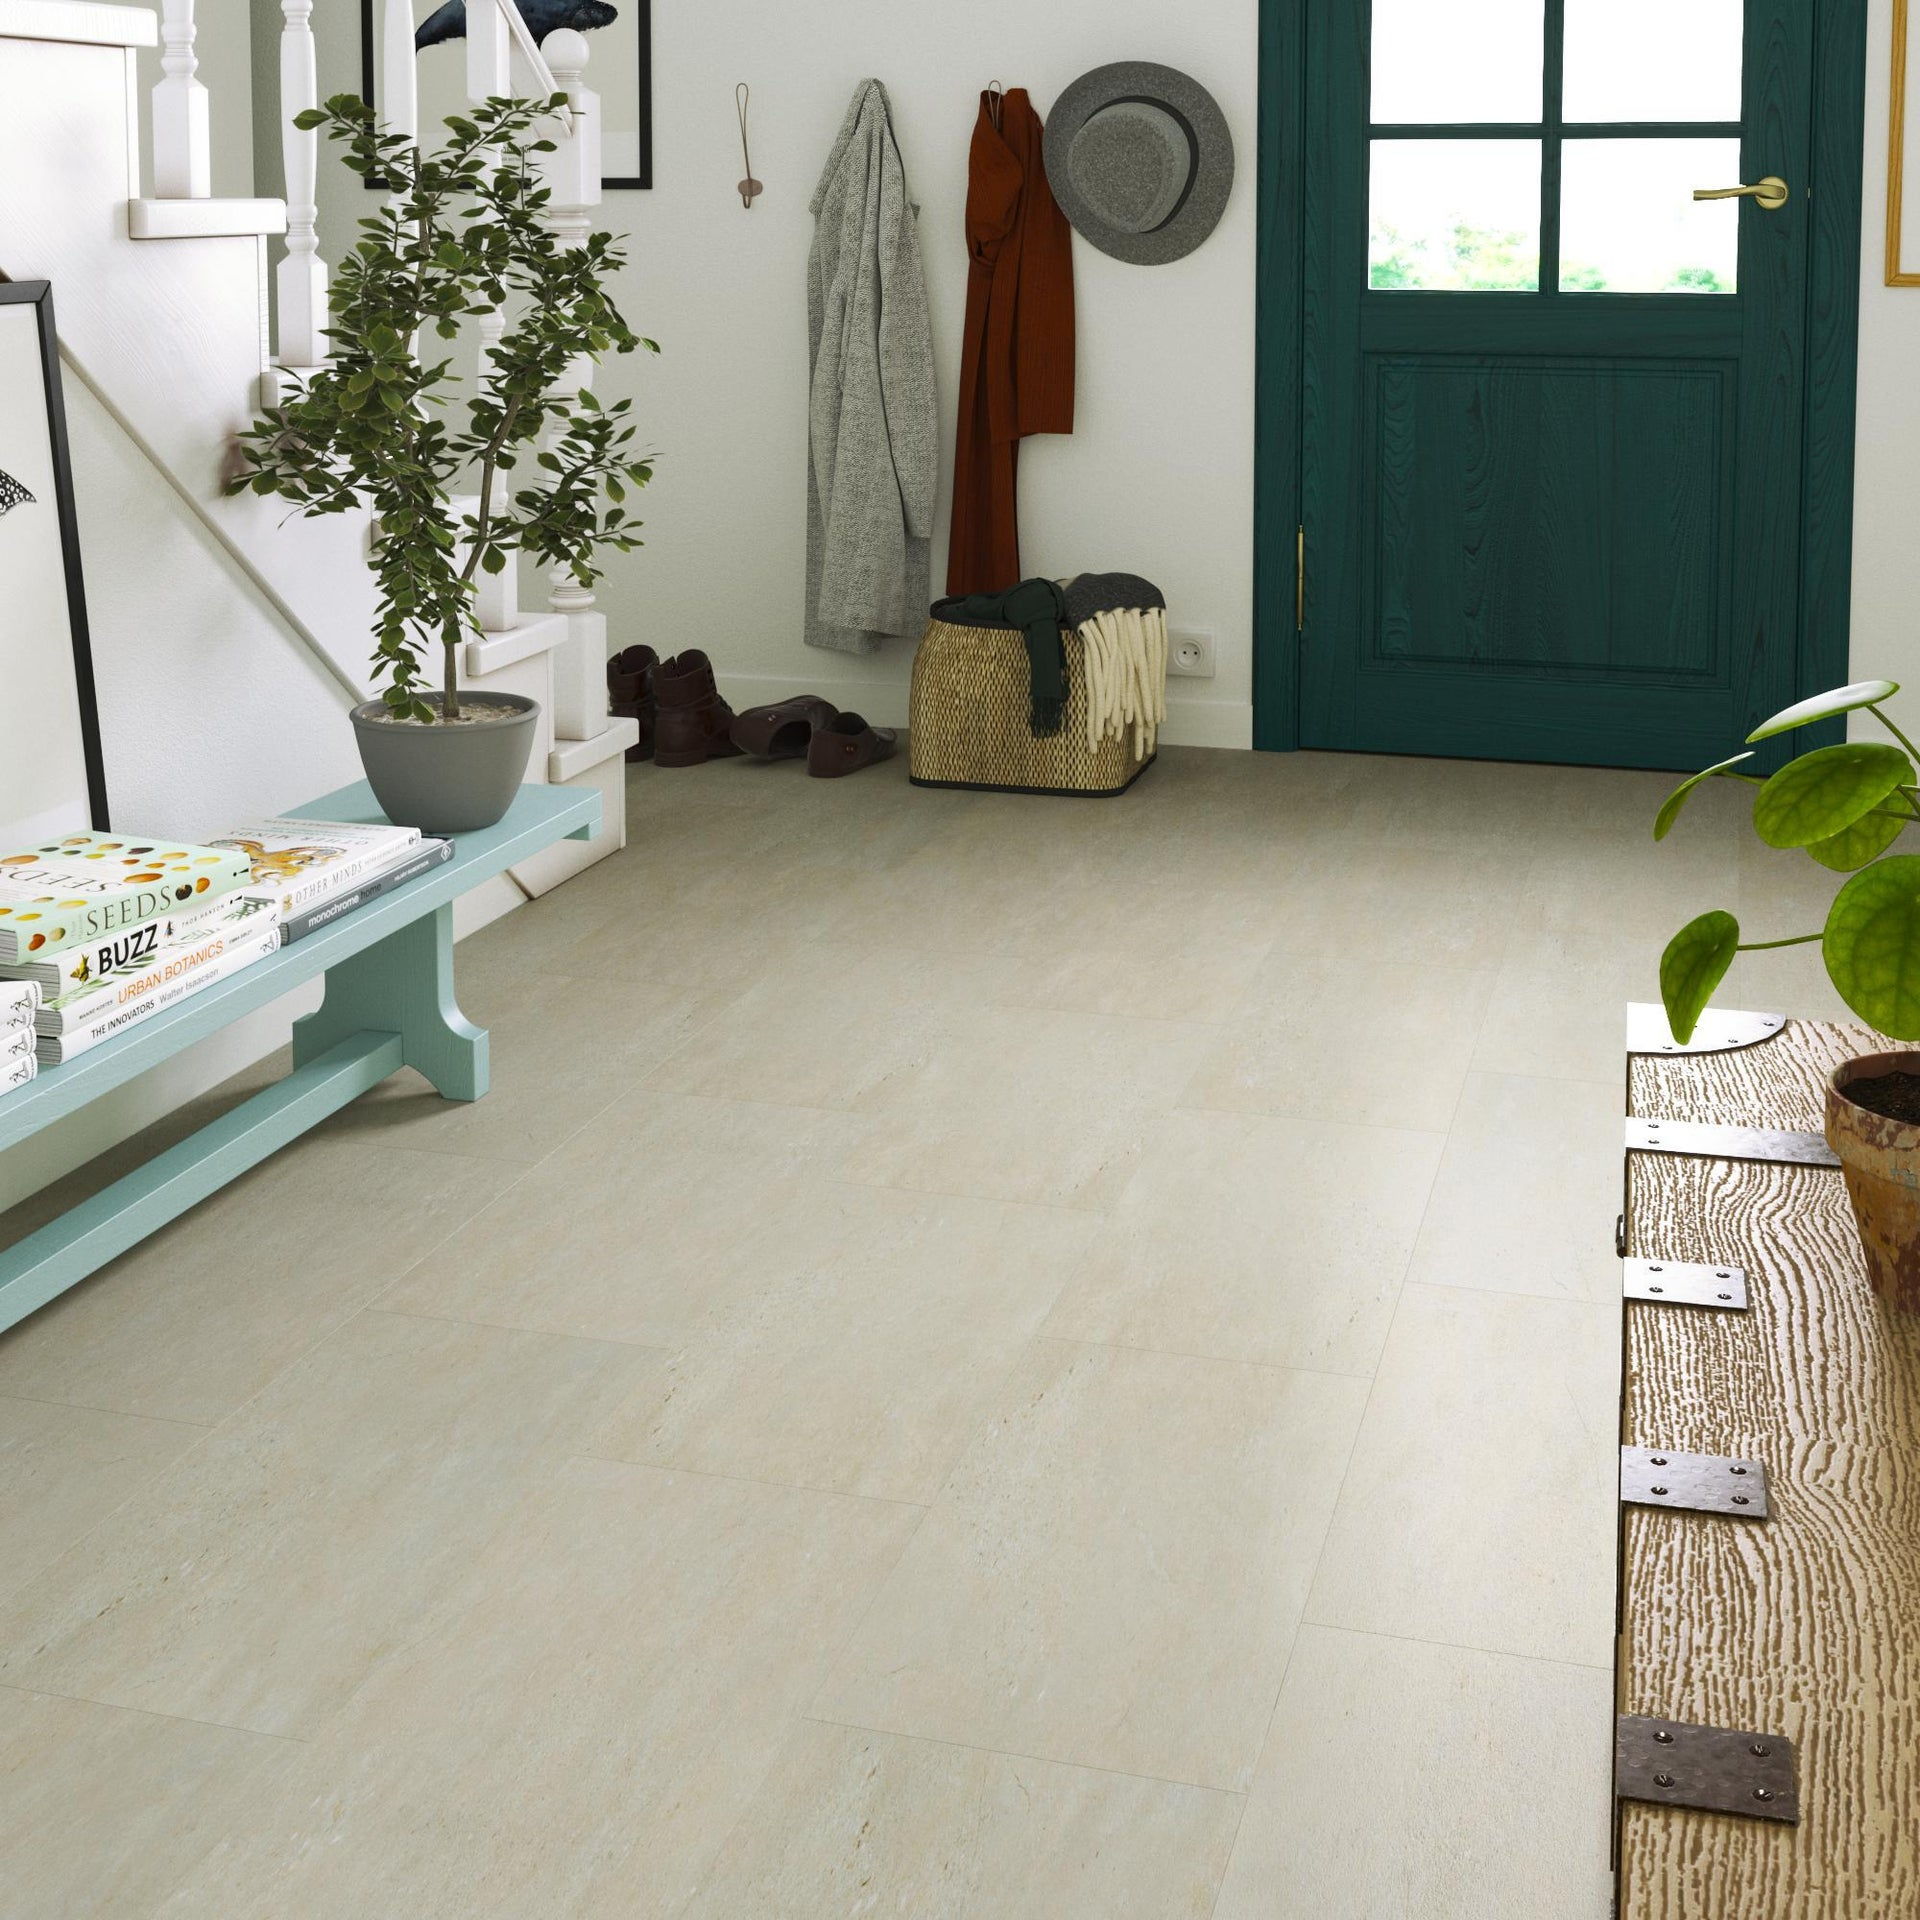 Pavimento PVC adesivo Limestone Sp 2 mm grigio / argento - 7